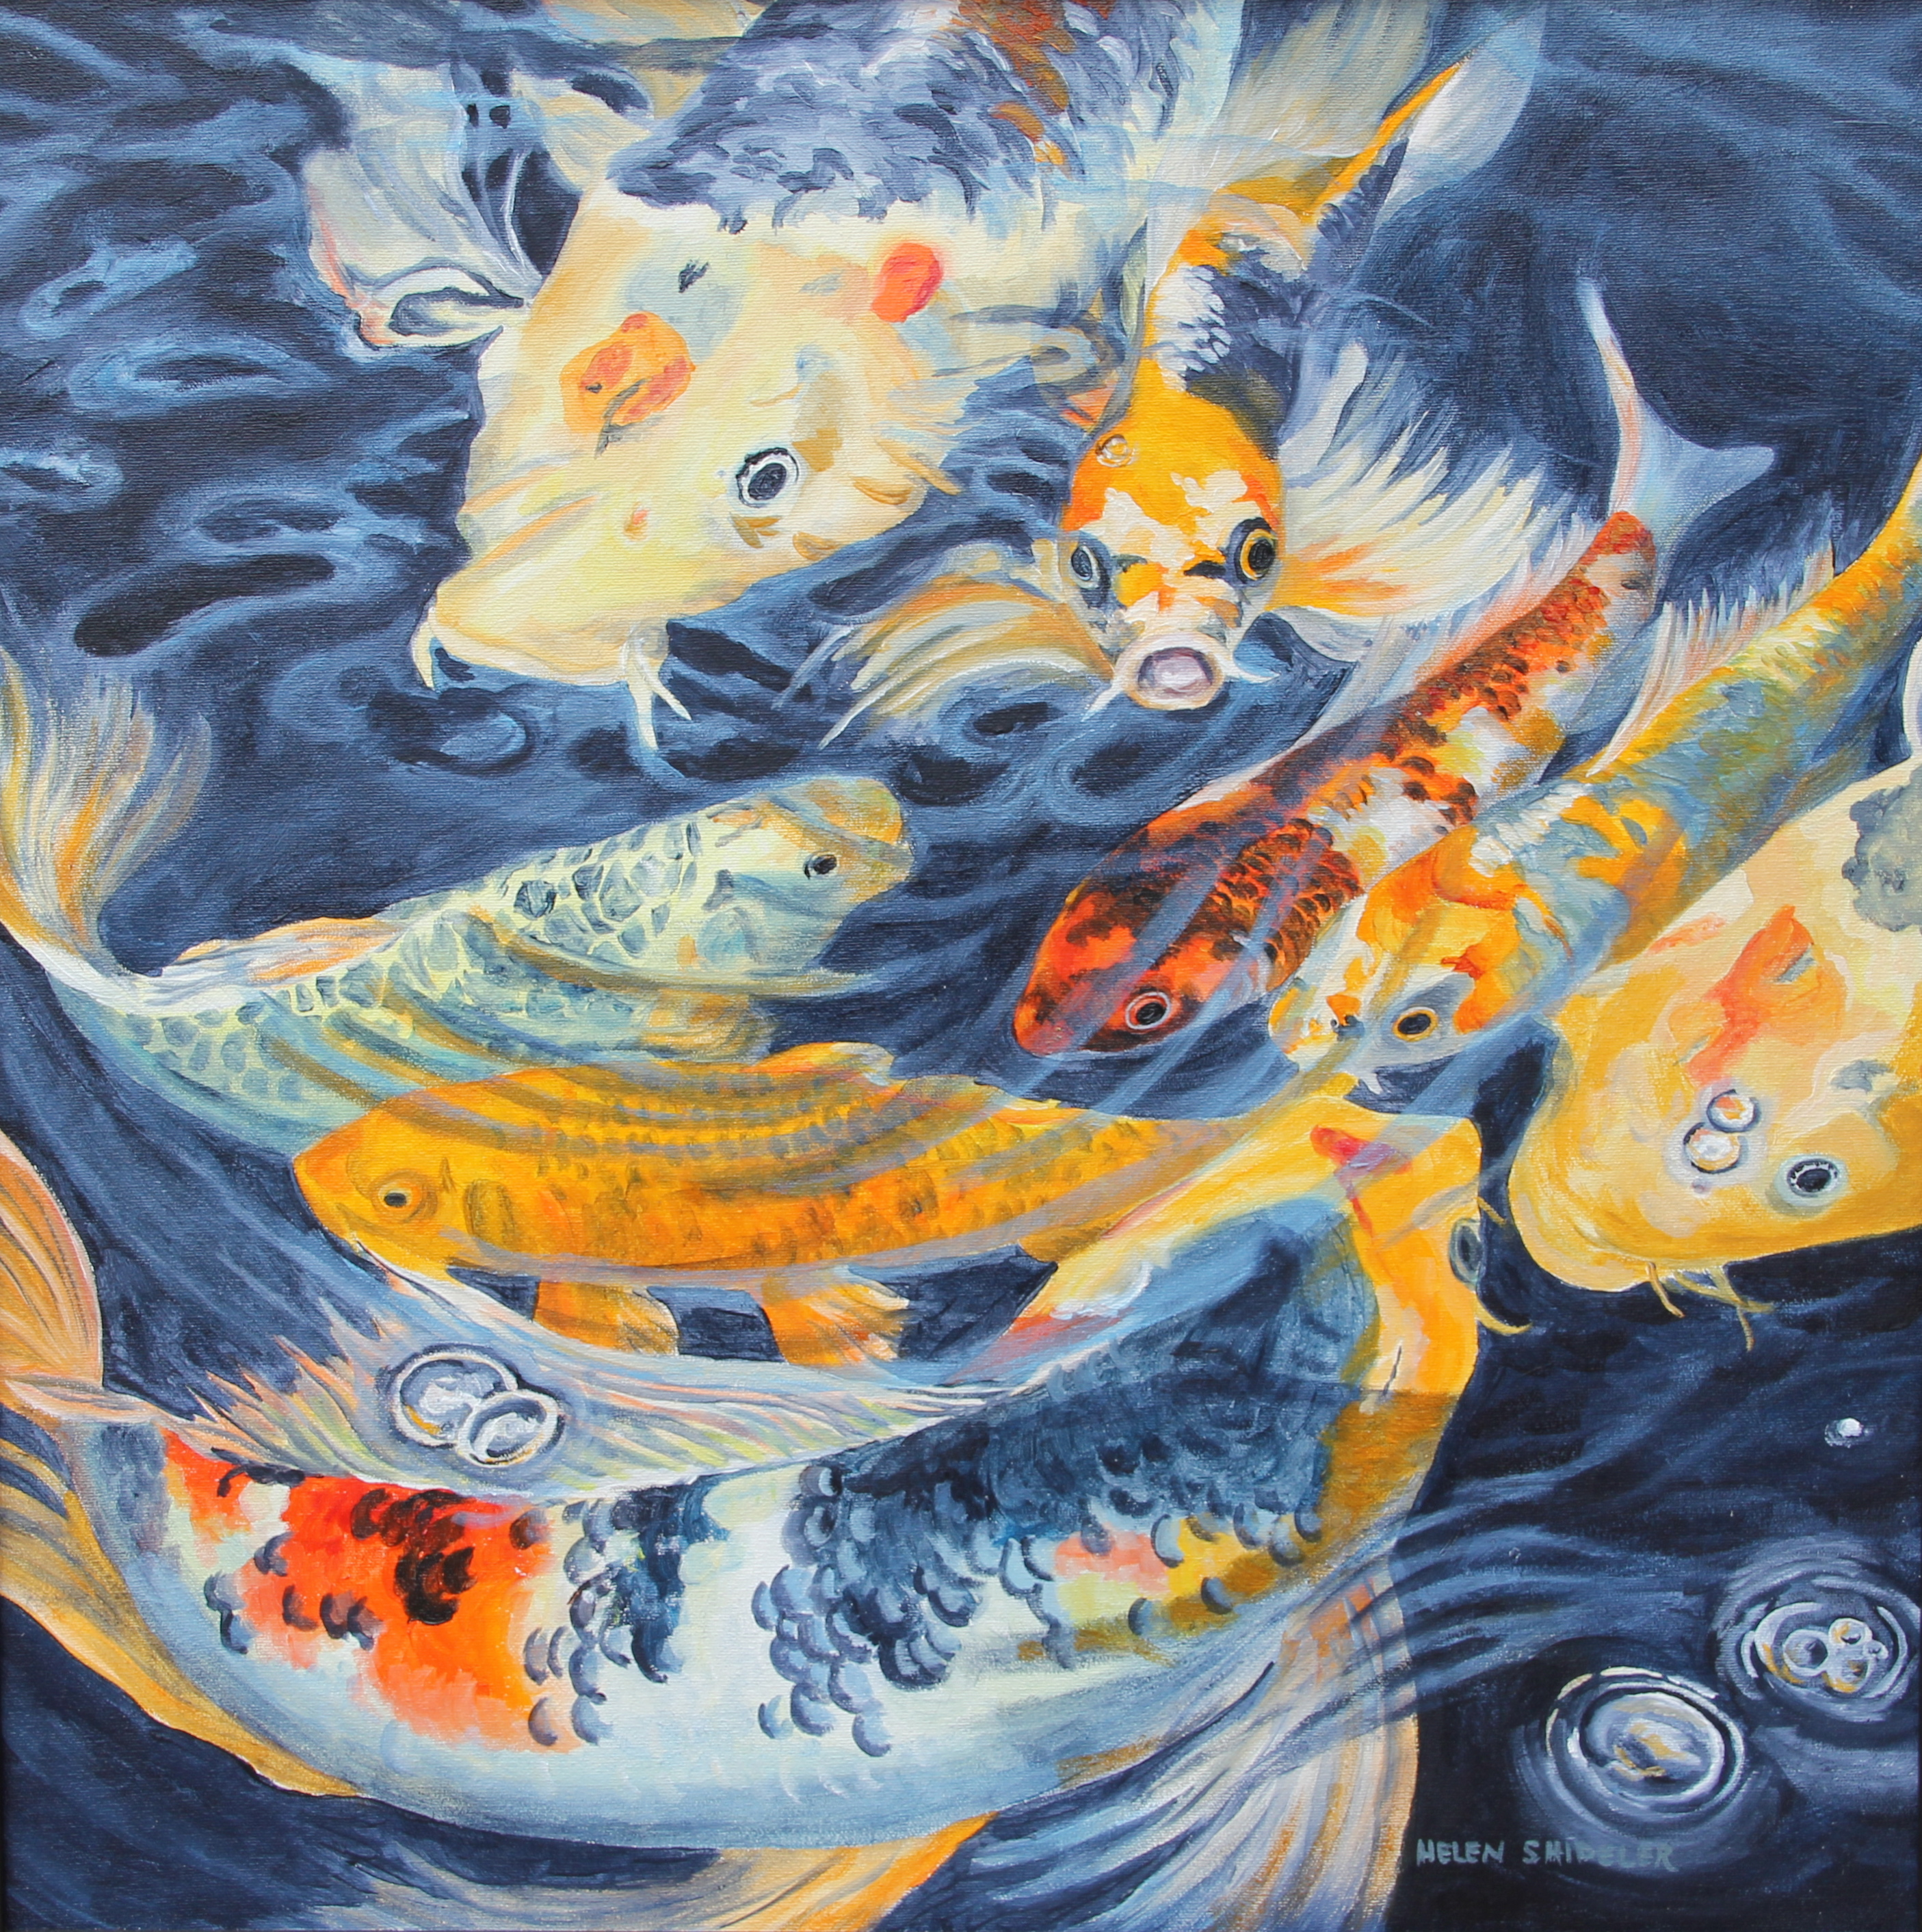 Oil painting oif koi fish helen shideler cspwc for Koi fish art paintings